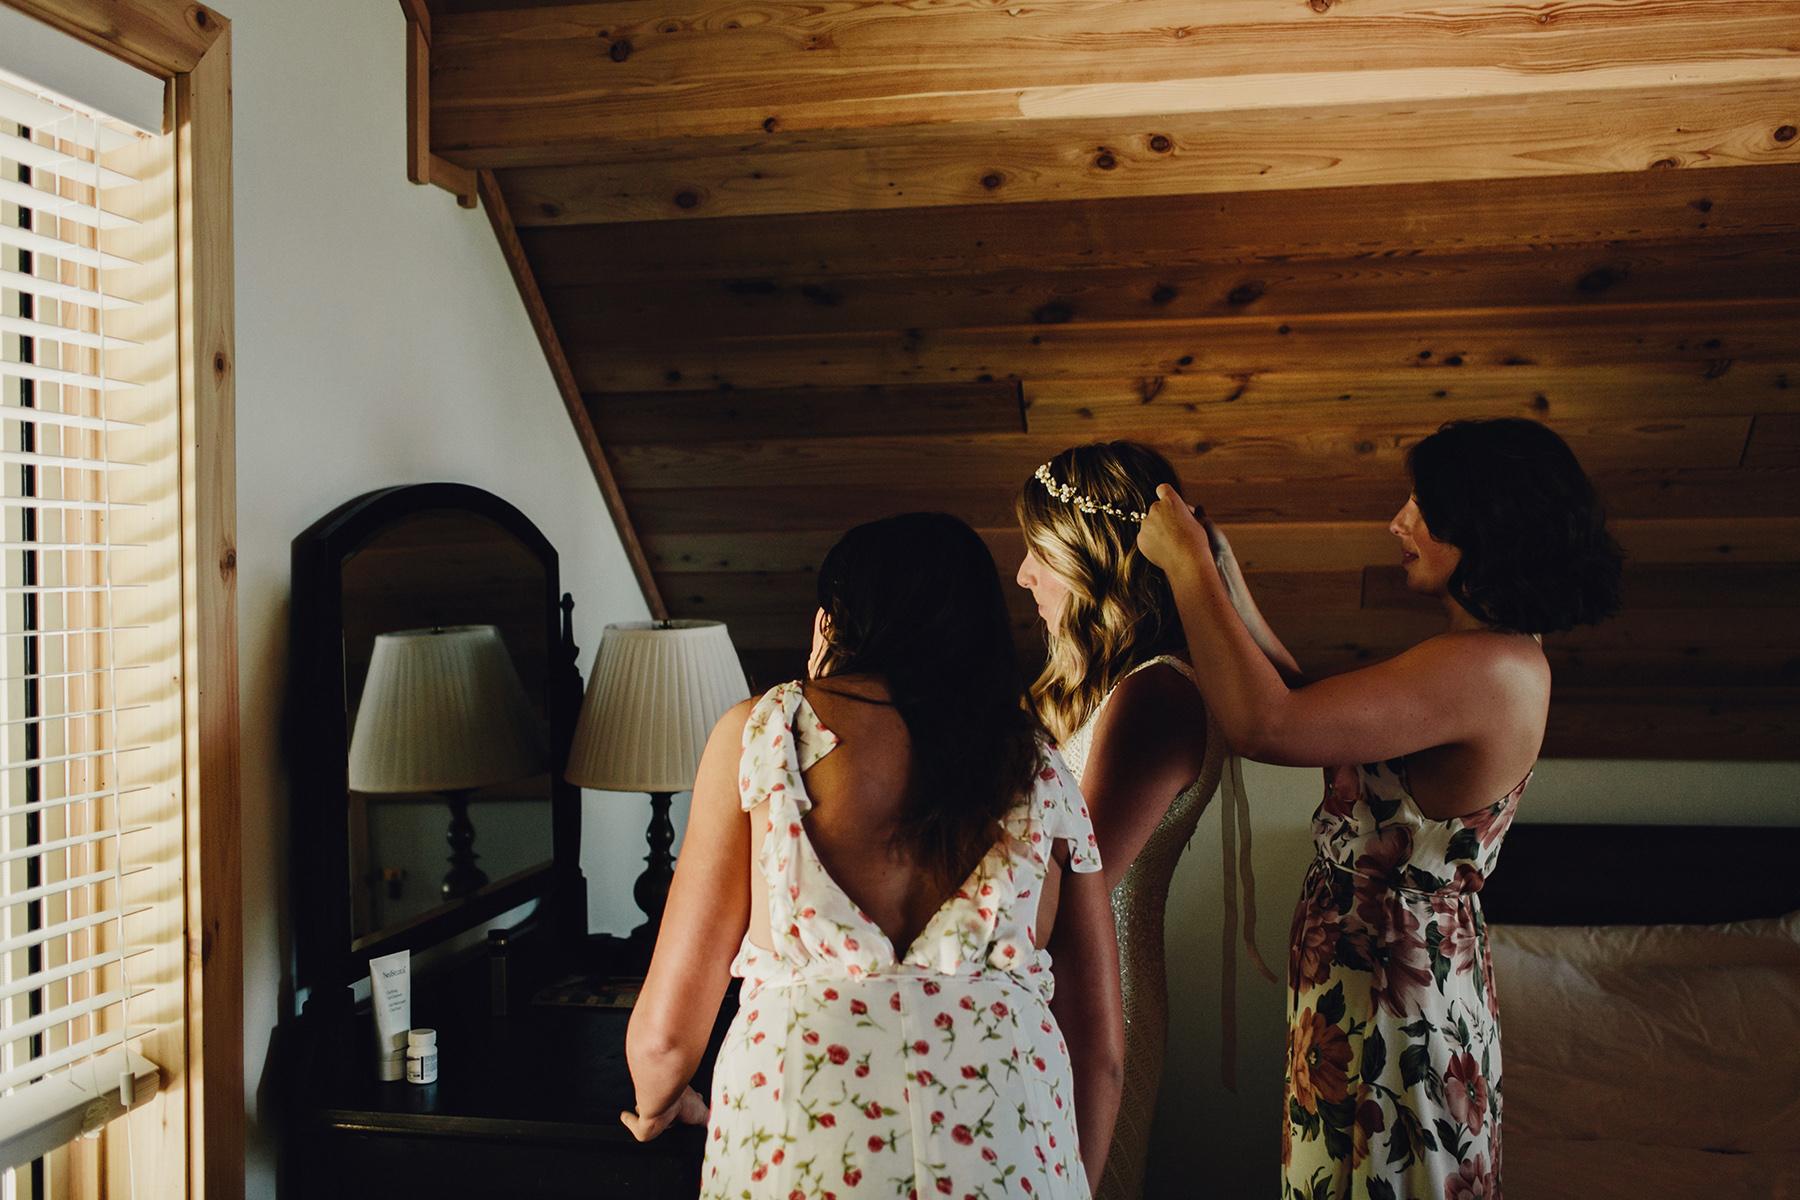 galiano-island-bodega-destination-wedding-0027.JPG